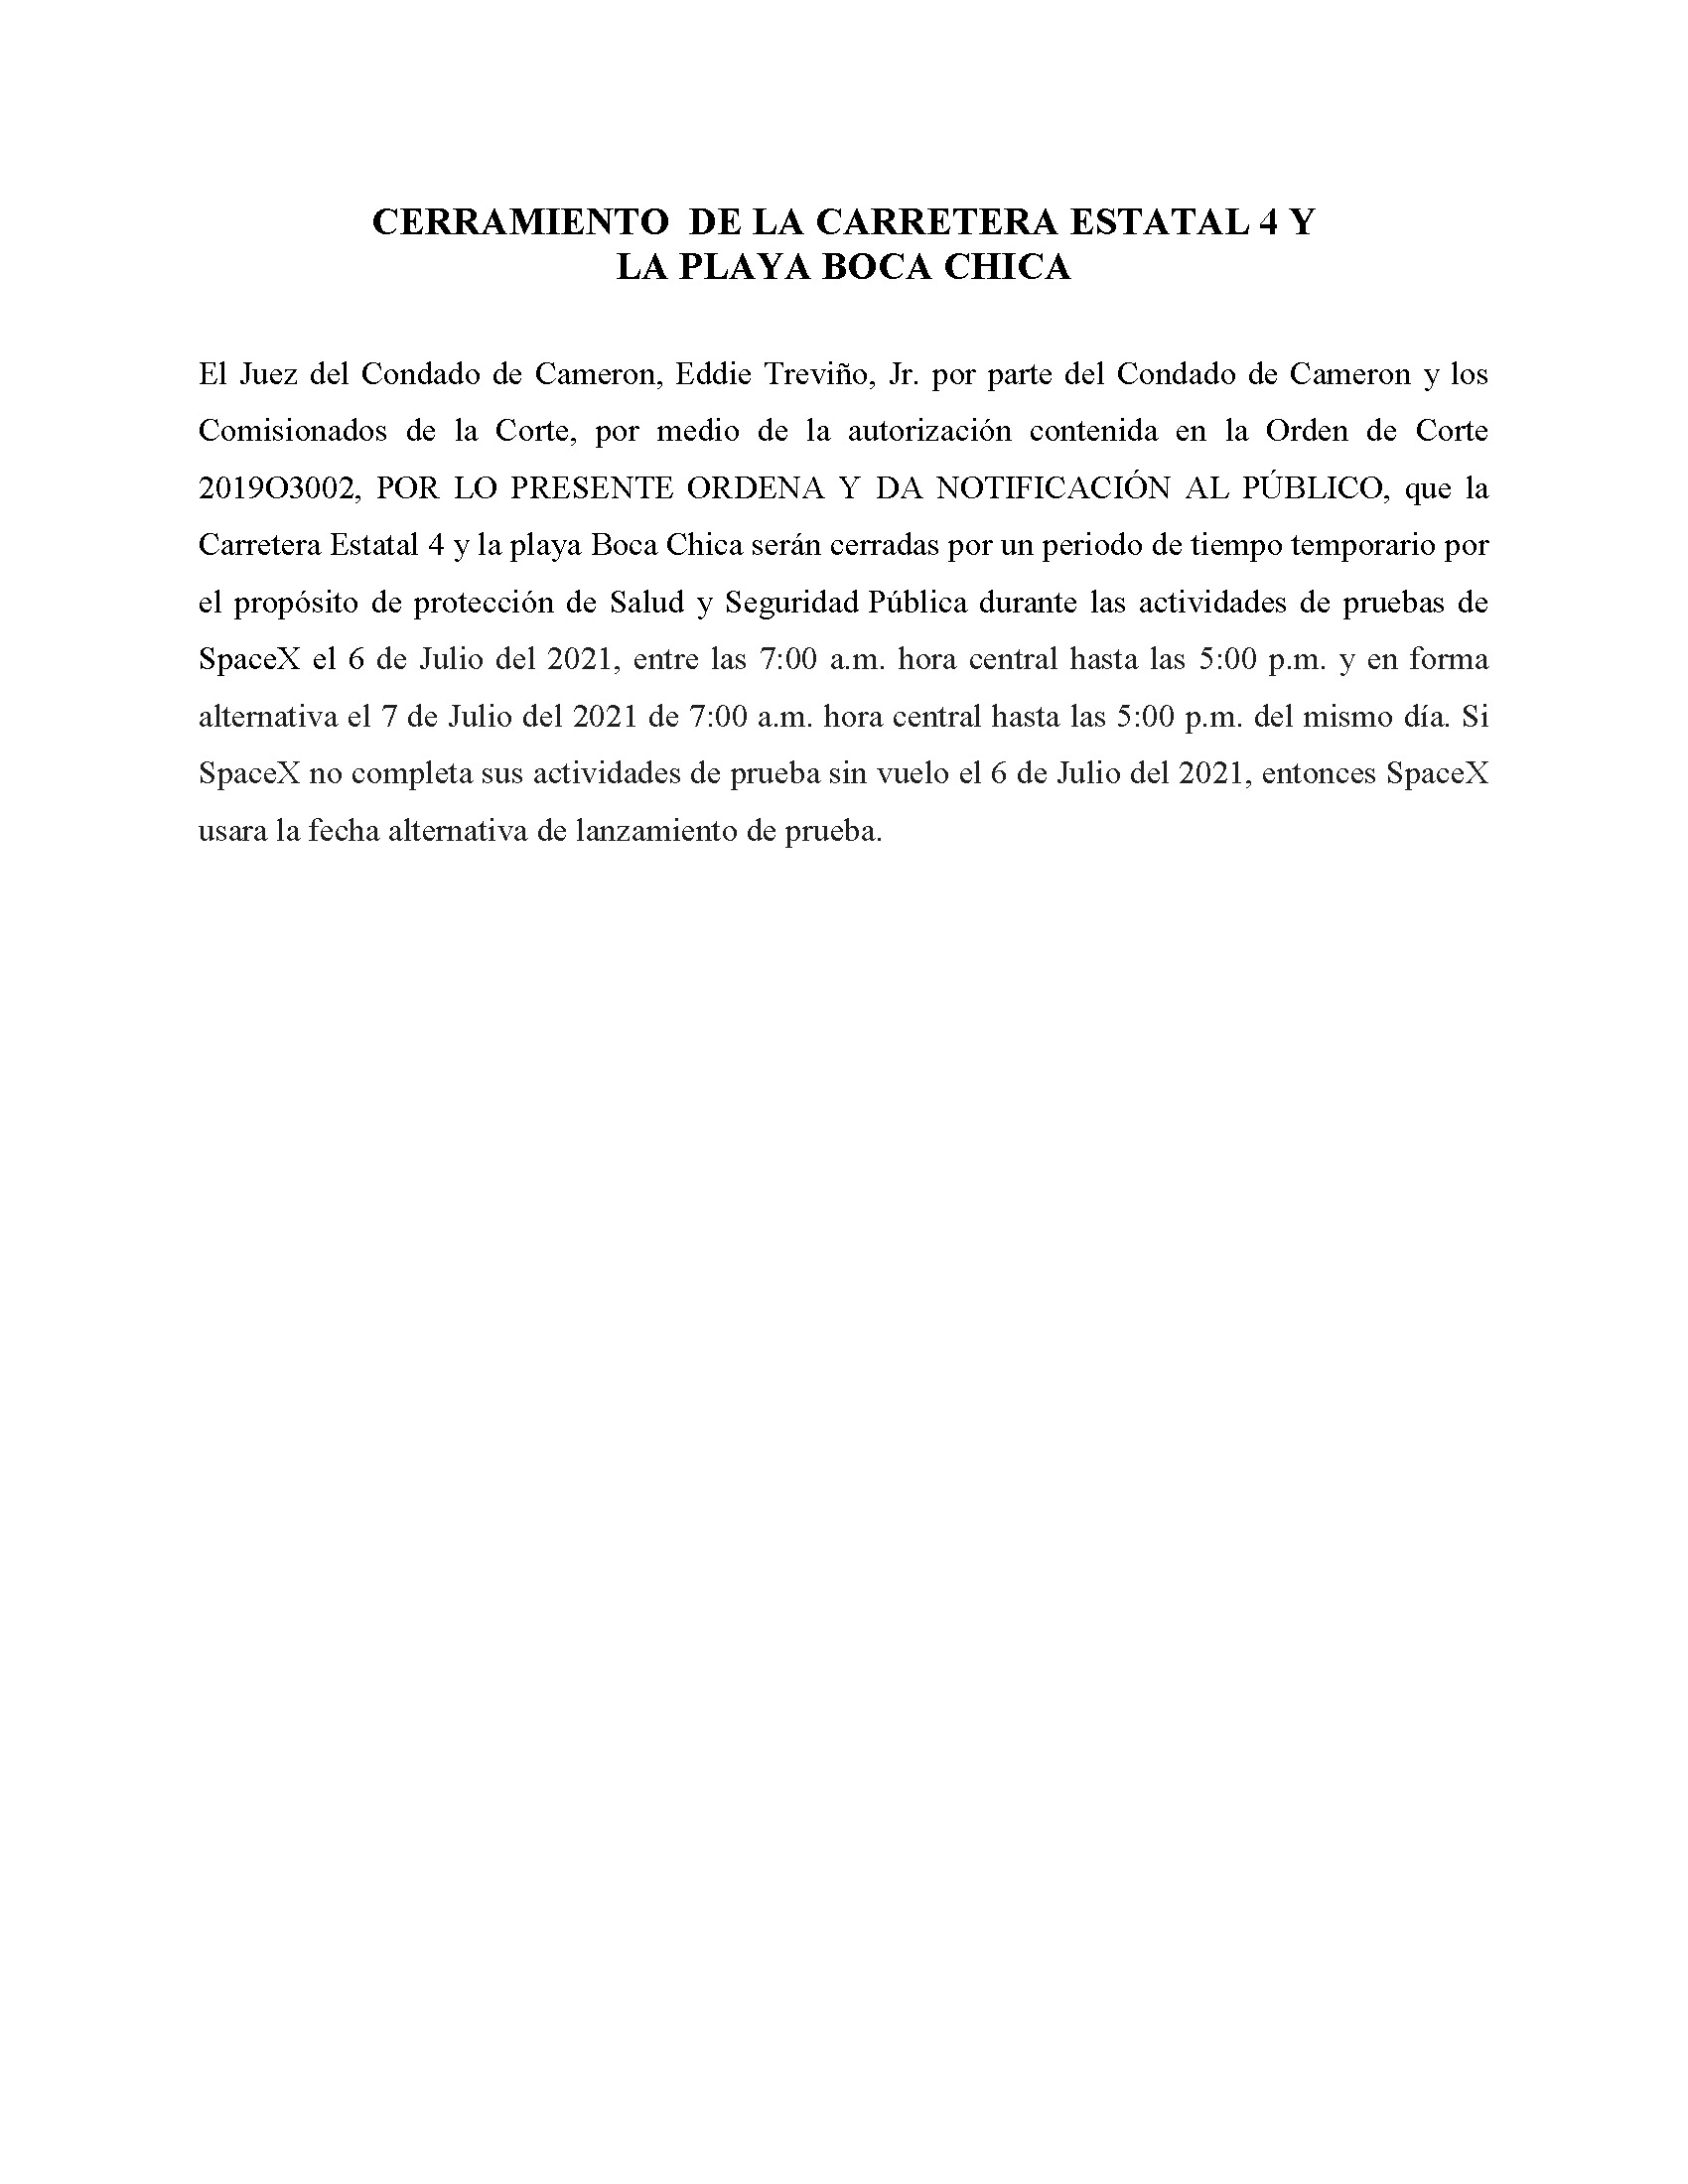 ORDER.CLOSURE OF HIGHWAY 4 Y LA PLAYA BOCA CHICA.SPANISH.07.06.2021